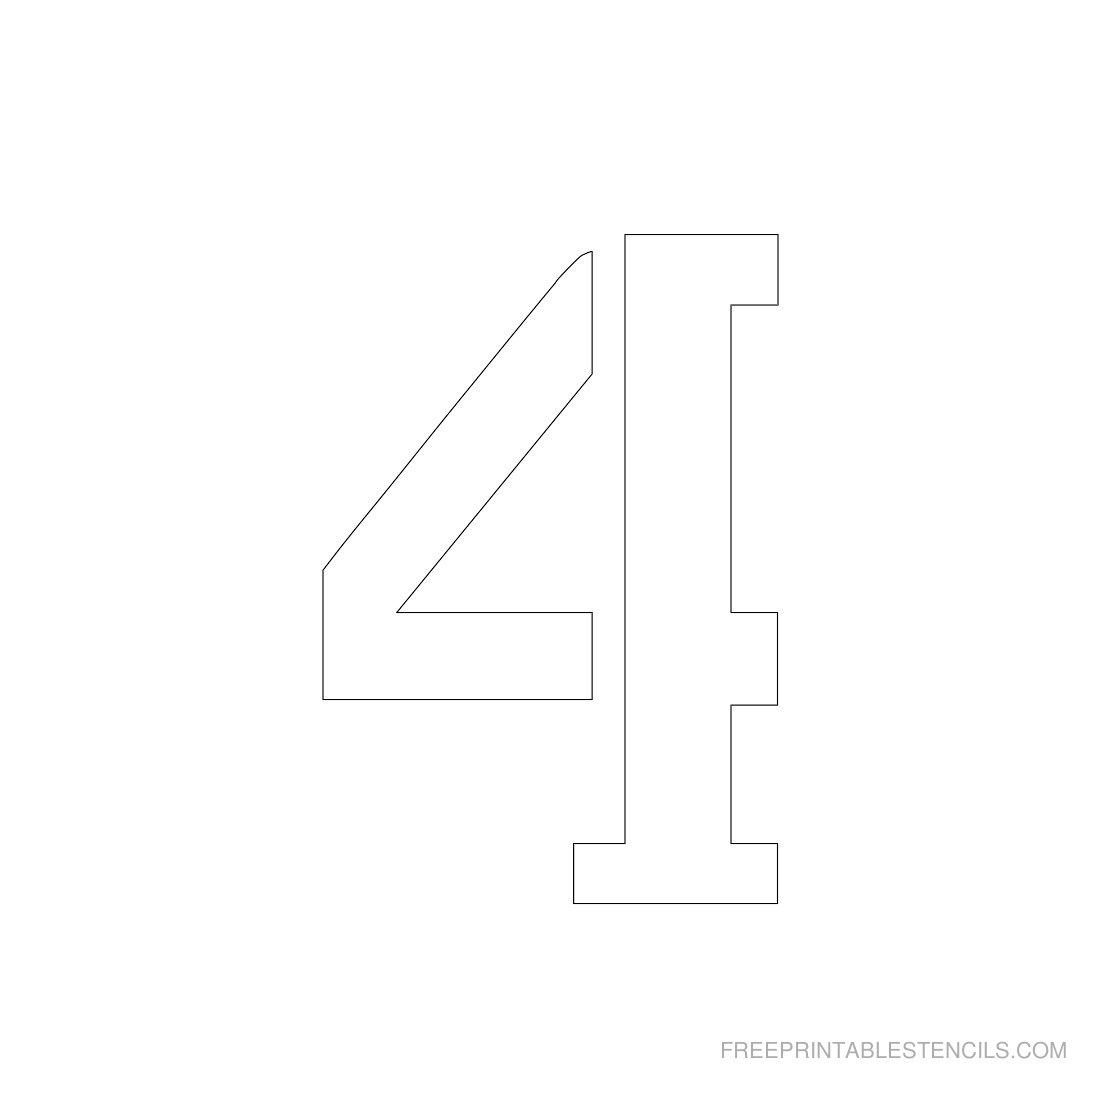 Printable 3 Inch Number Stencils 1-10 | Free Printable Stencils - One Inch Stencils Printable Free